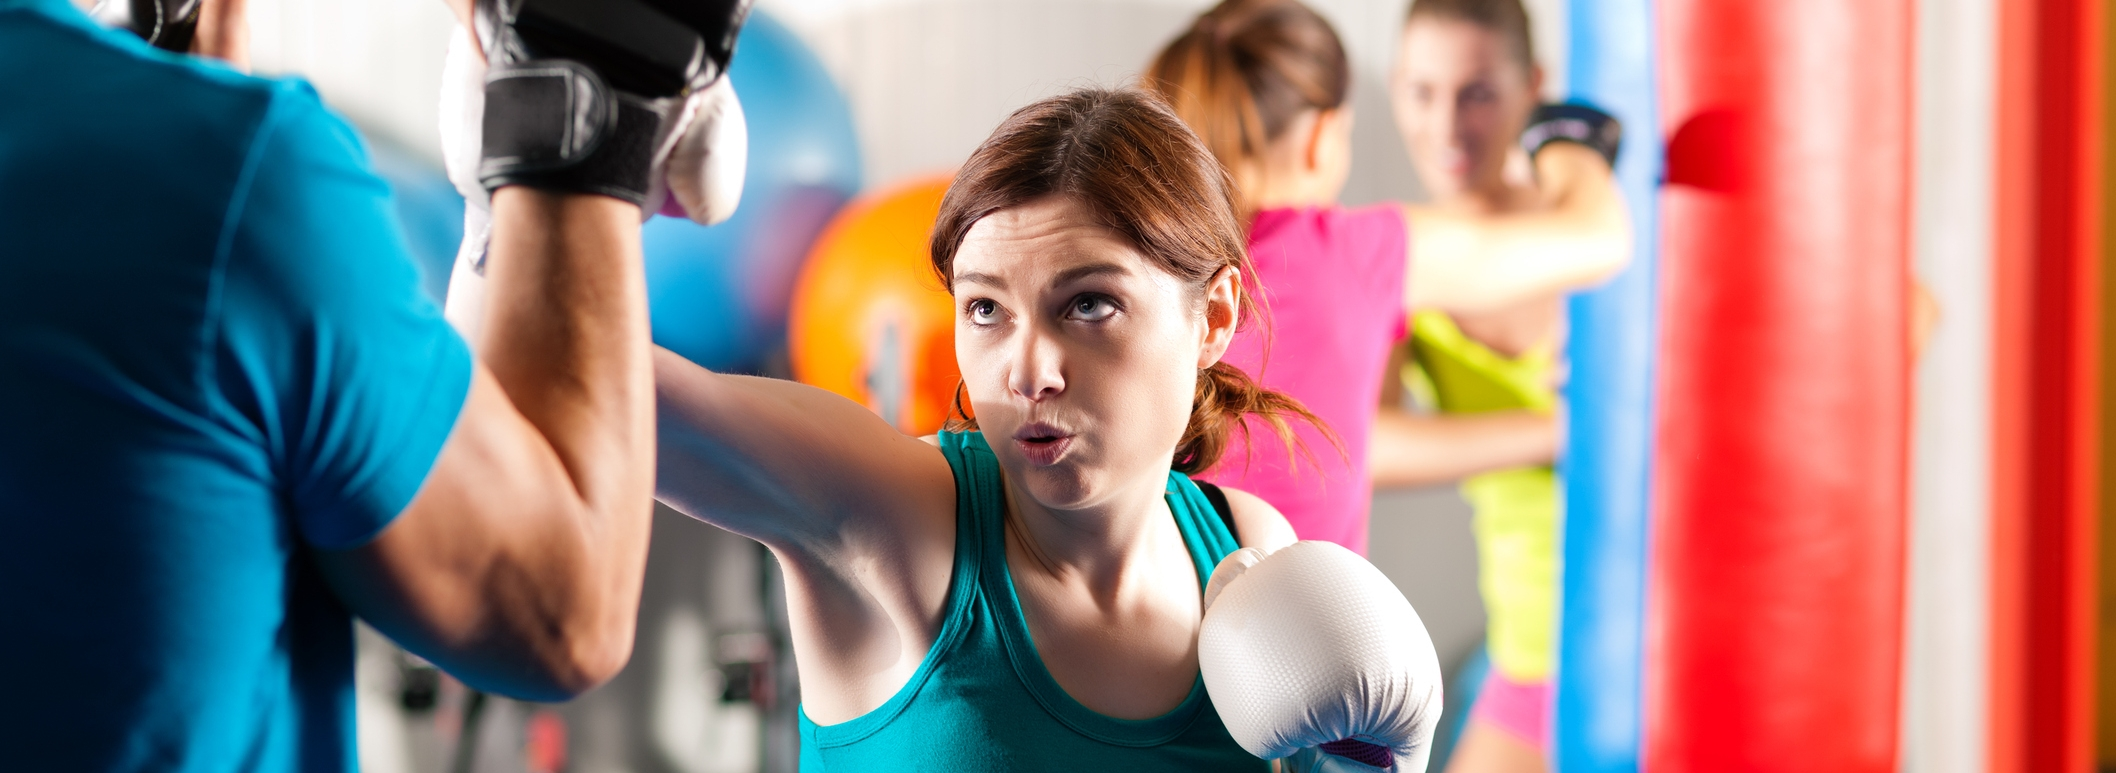 kick boxing 7.jpg